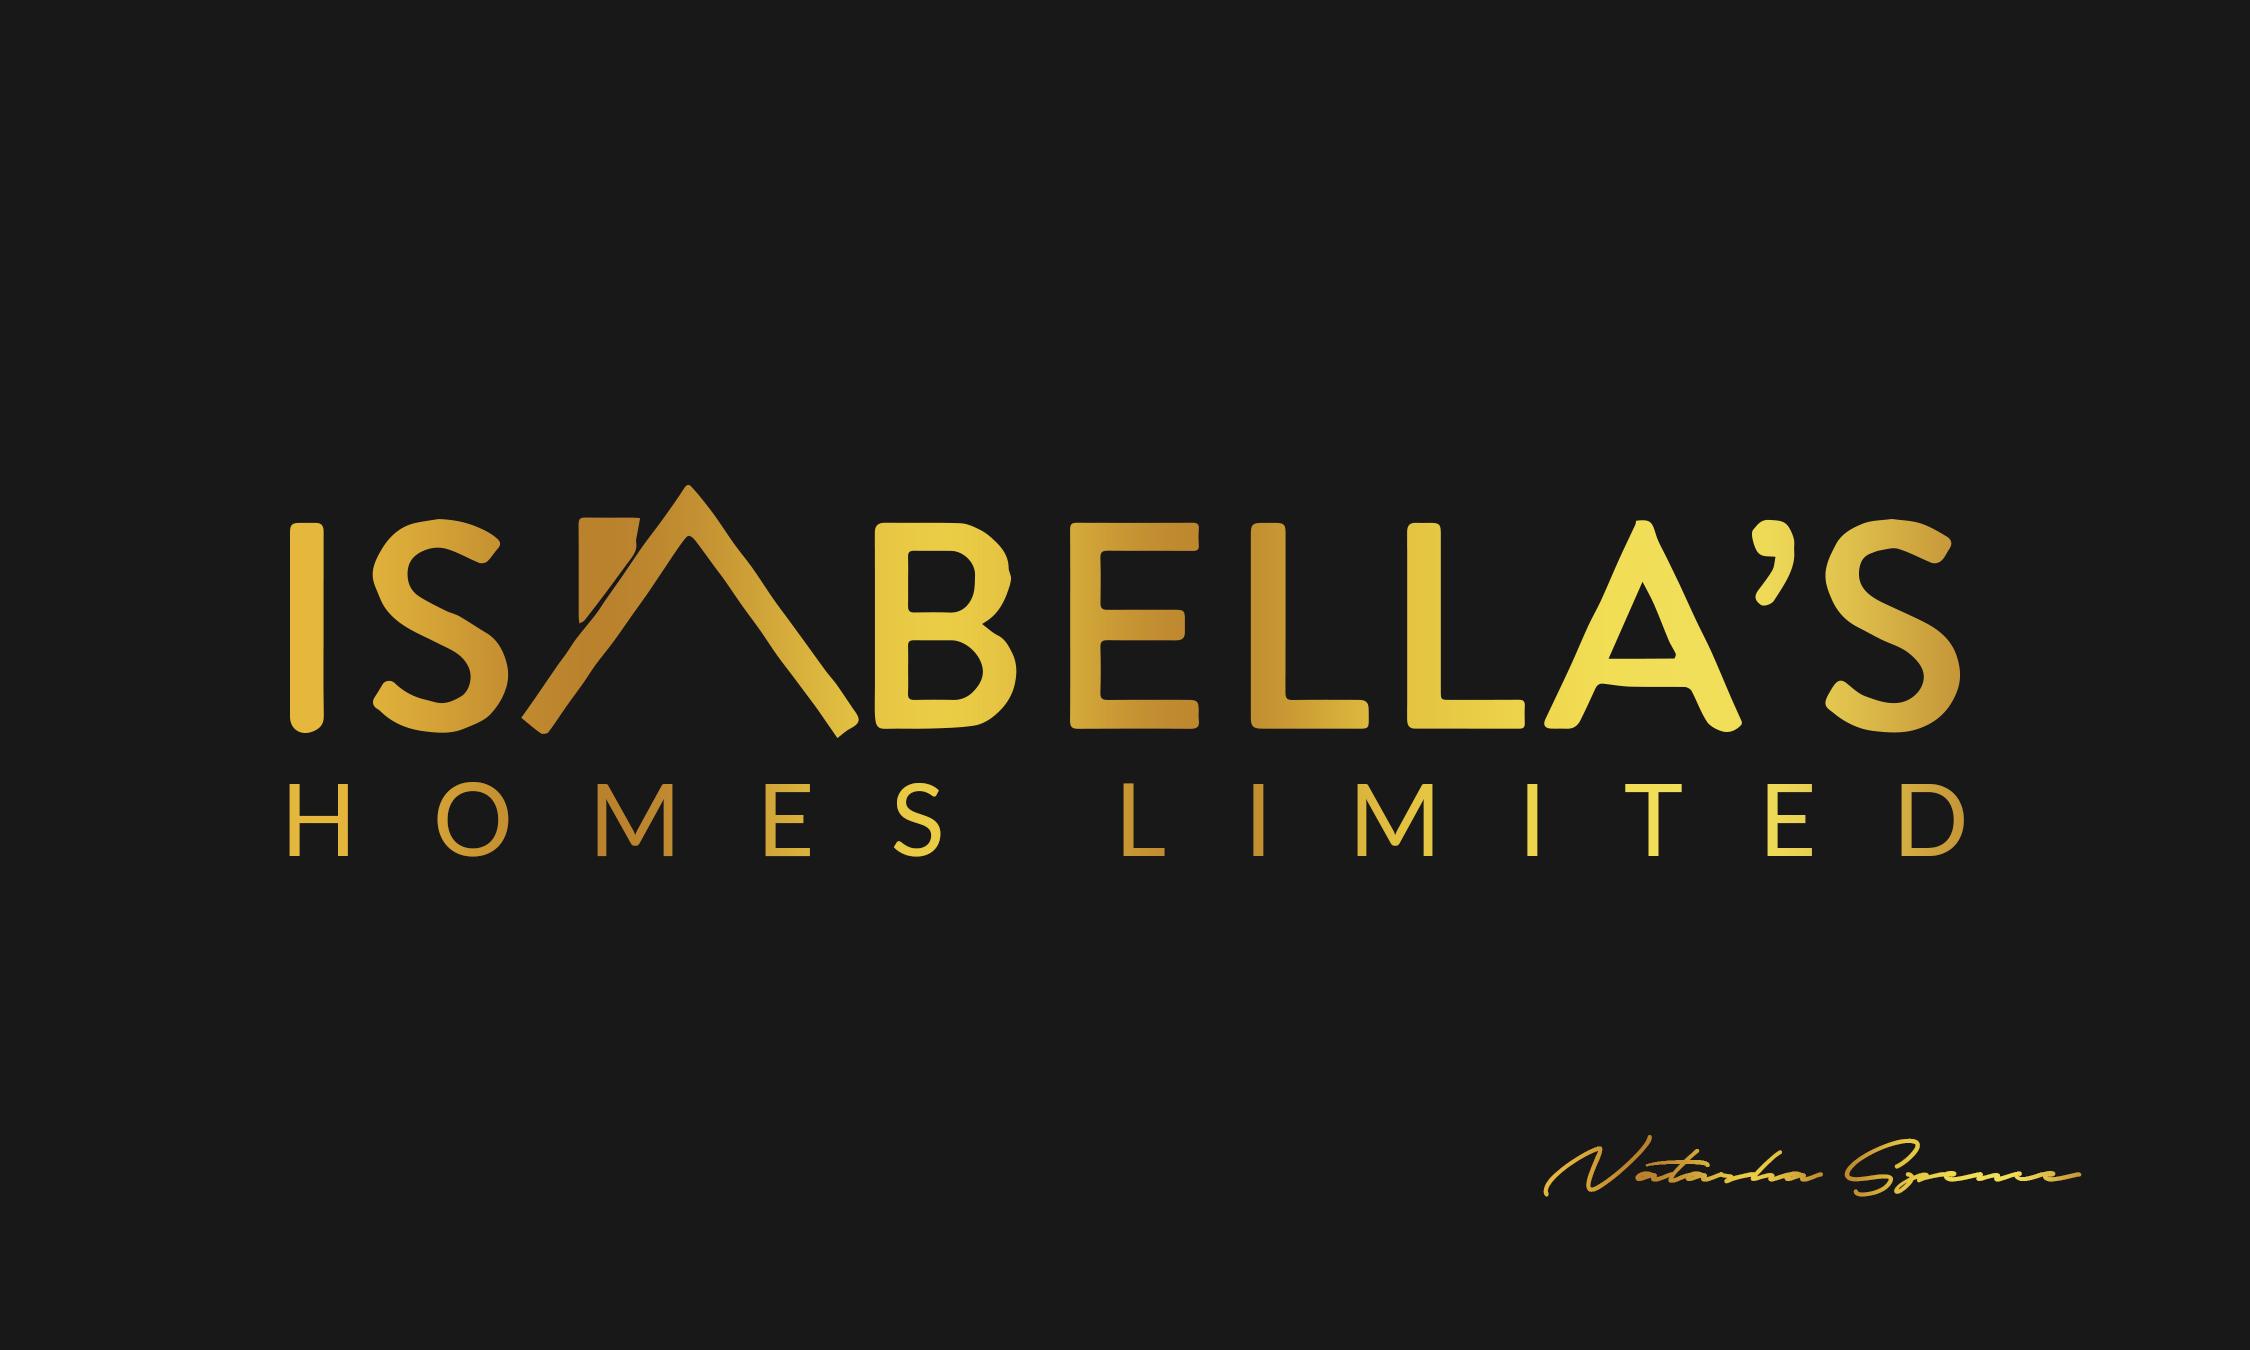 Isabellas Homes